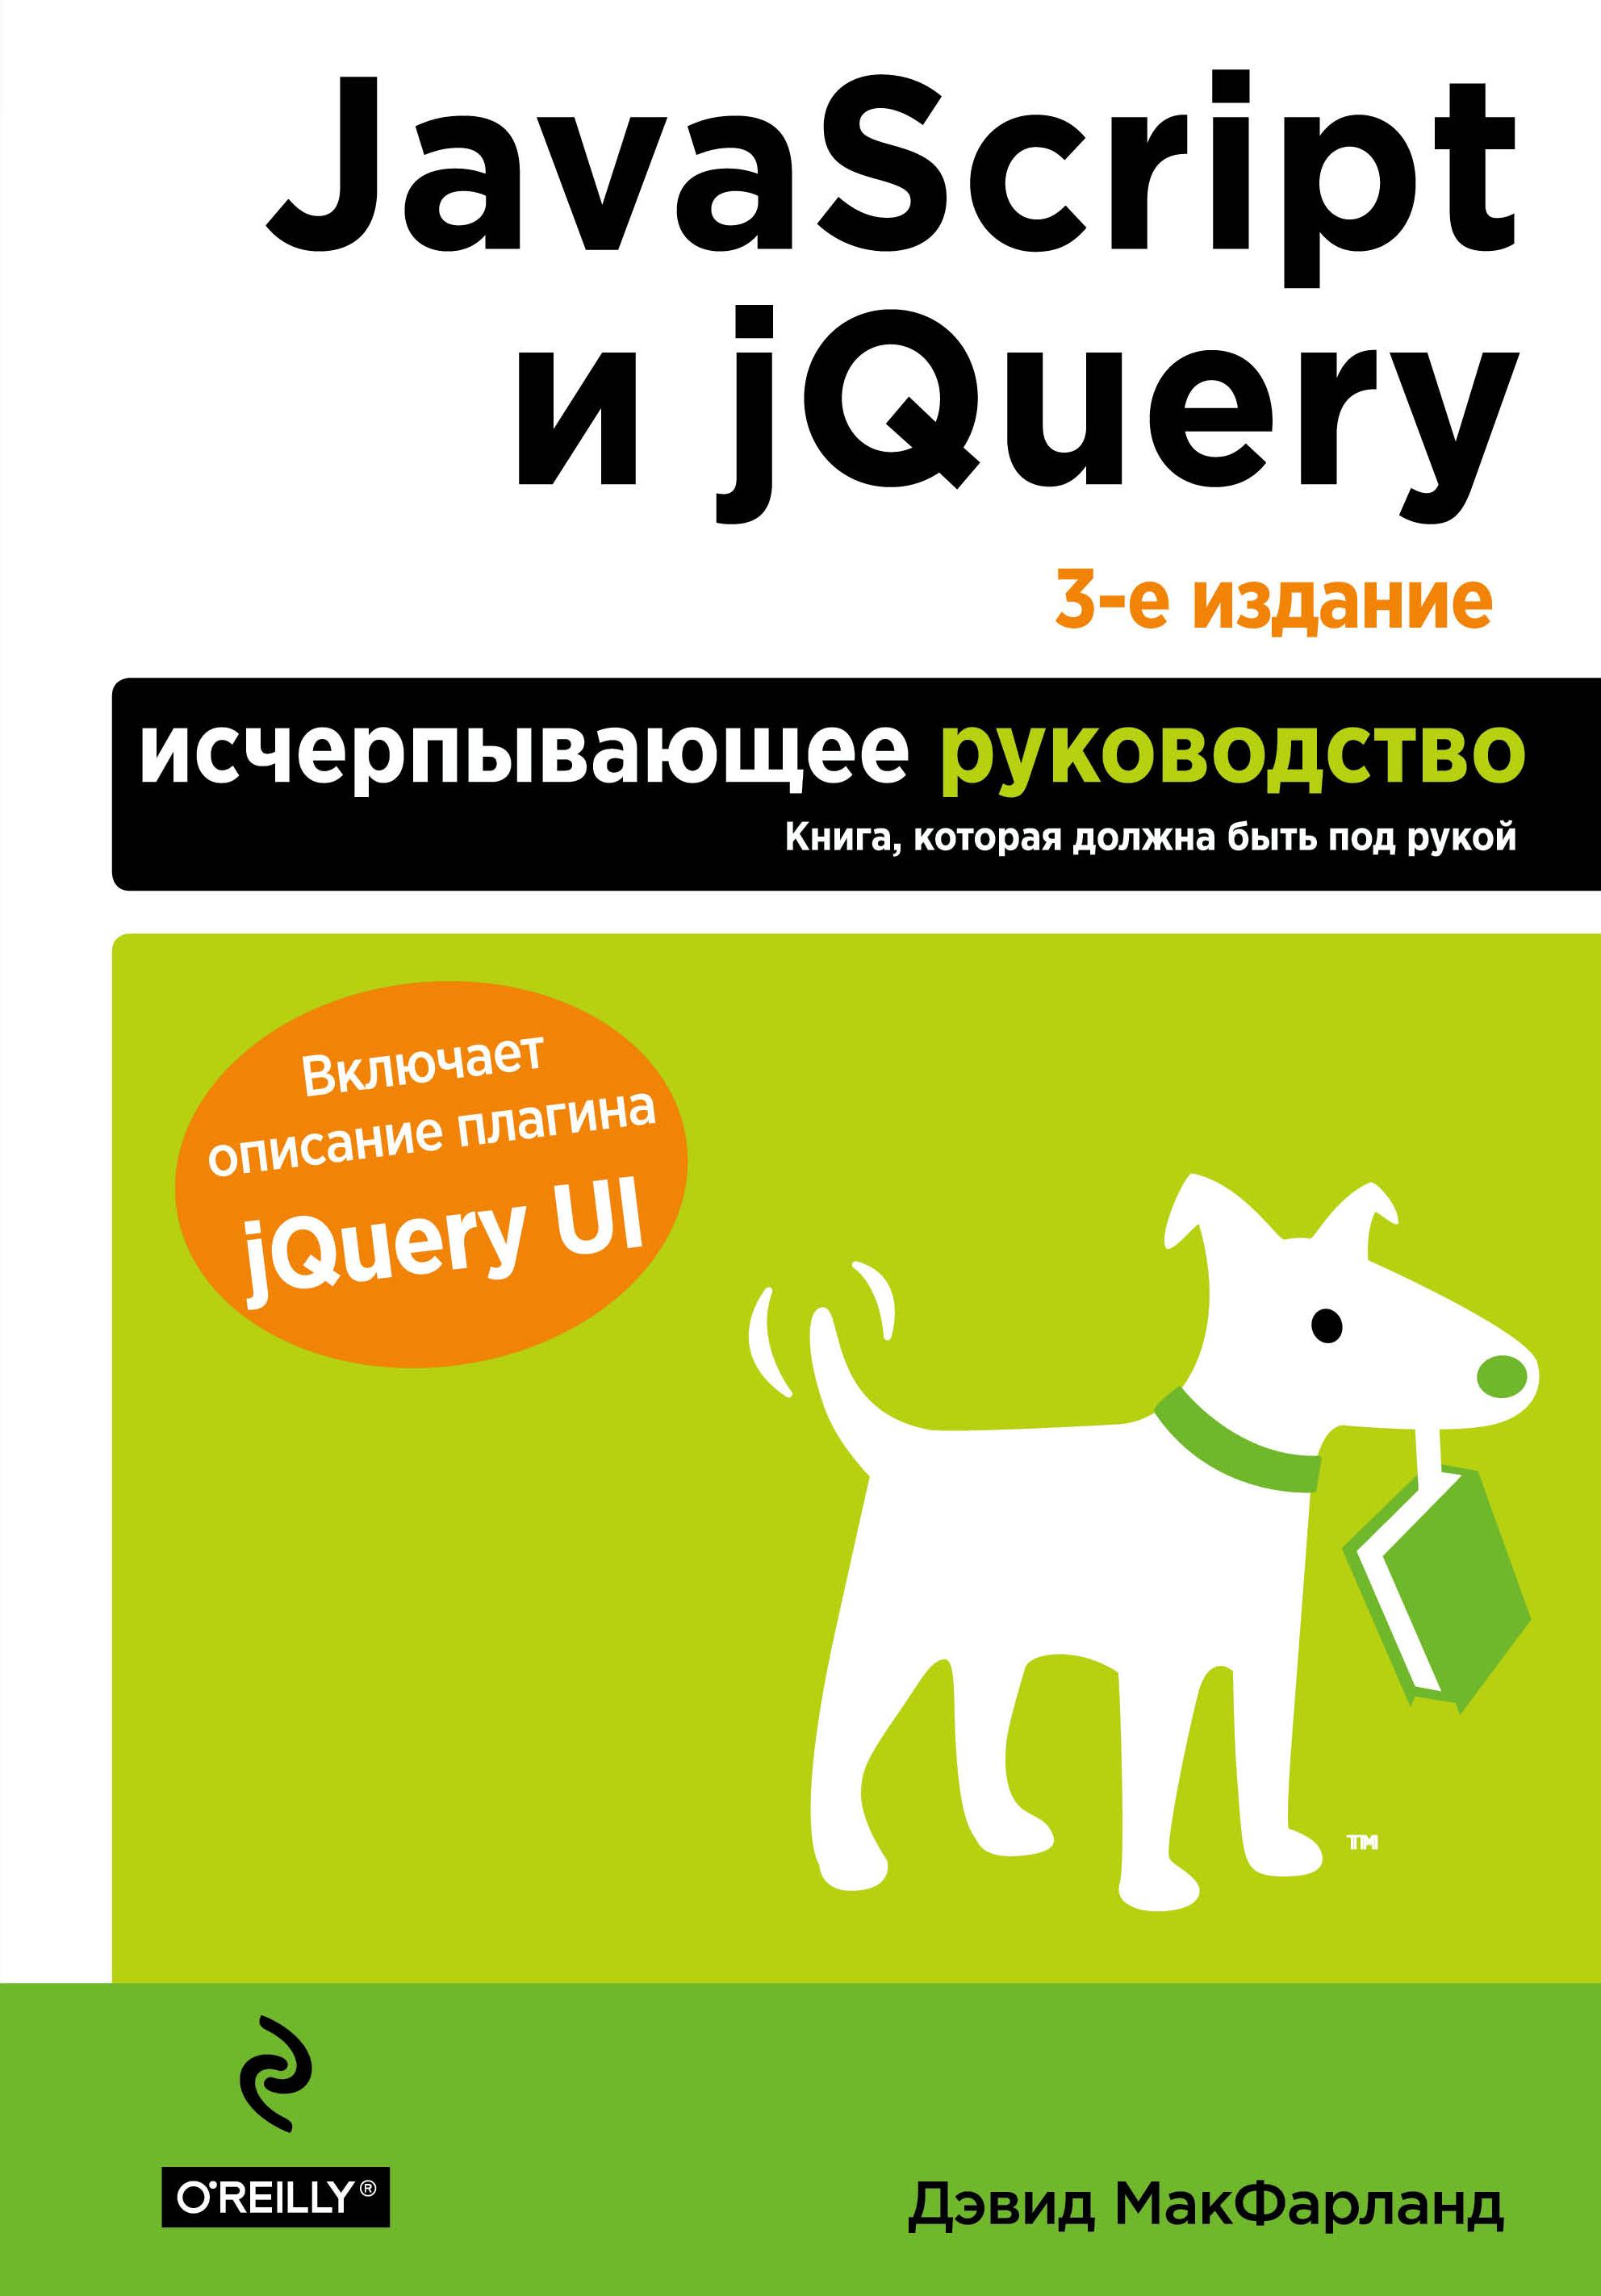 JavaScript и jQuery. Исчерпывающее руководство. 3-е издание